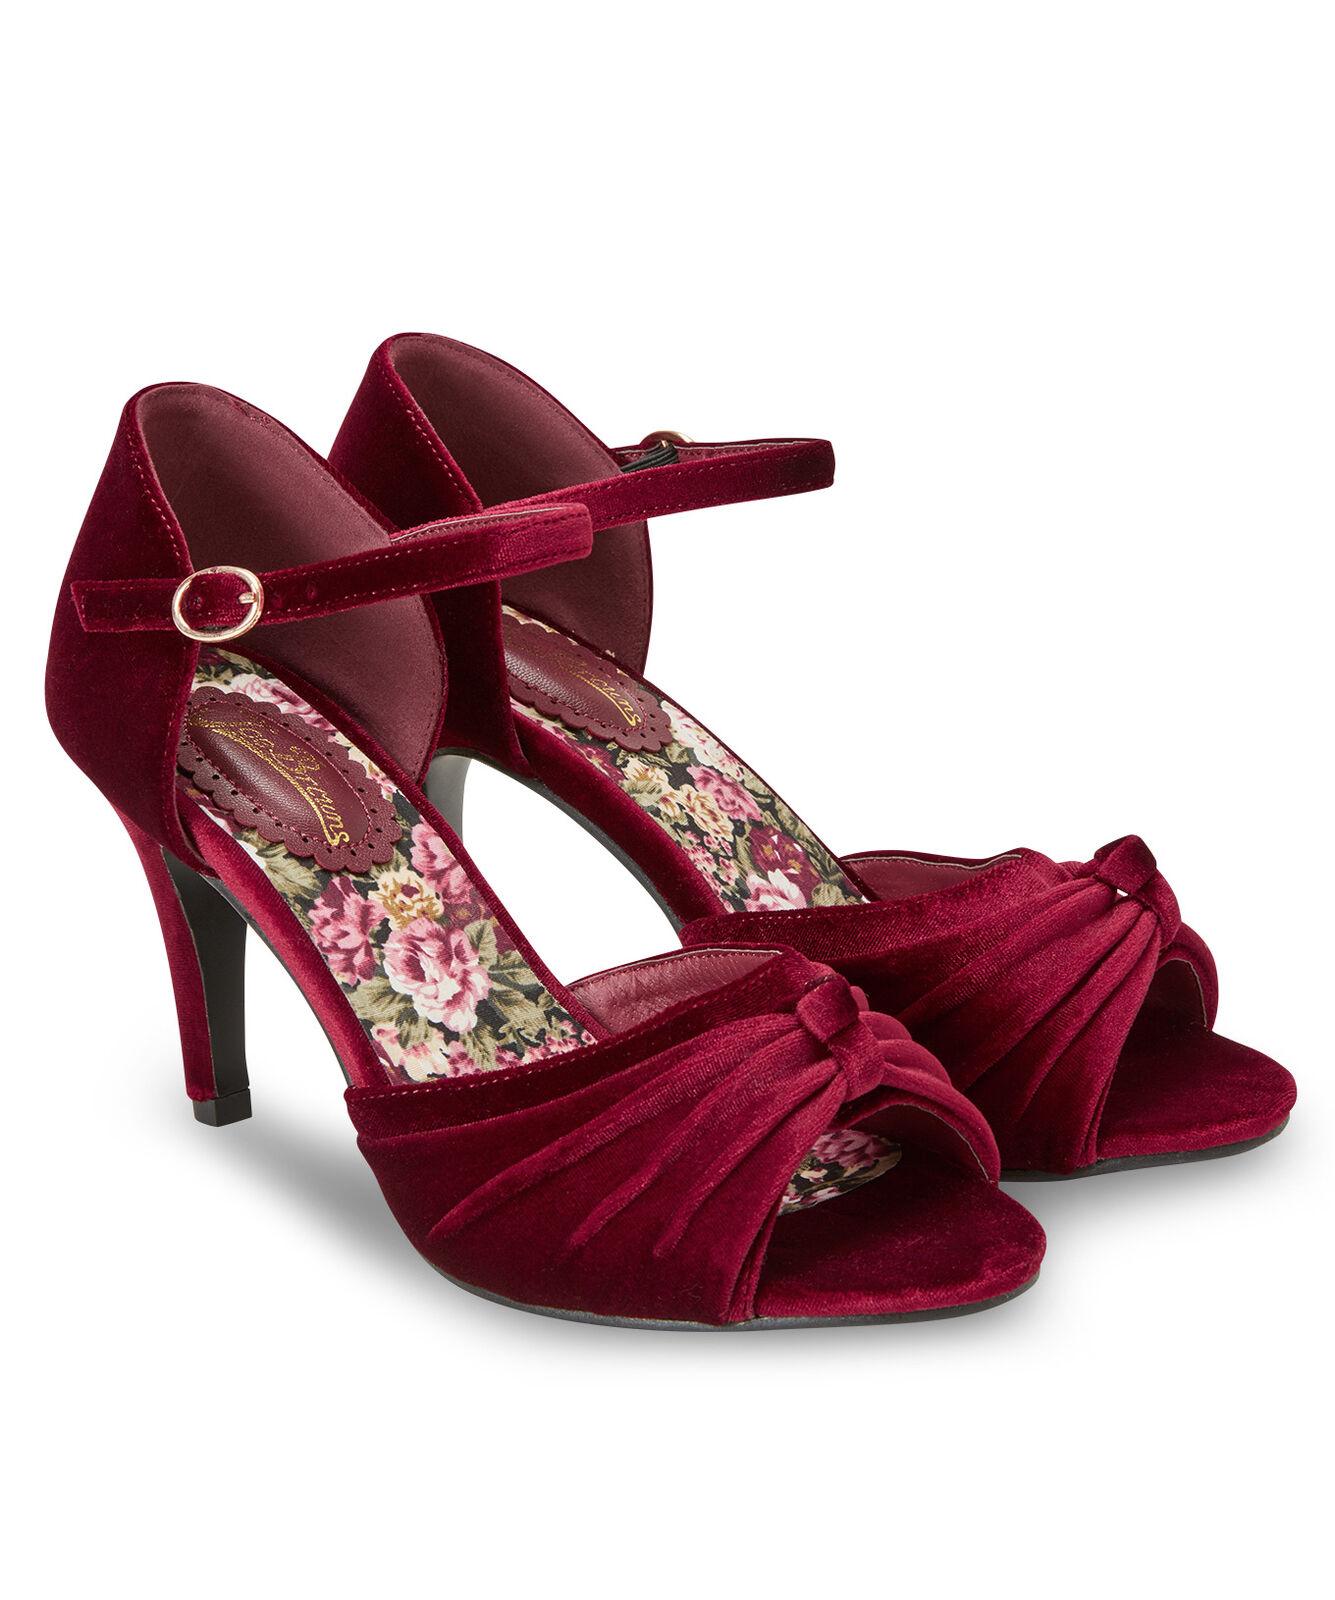 Joe brauns damen damen damen Velvet Ankle Strap schuhe Ruby A 4 6ce318